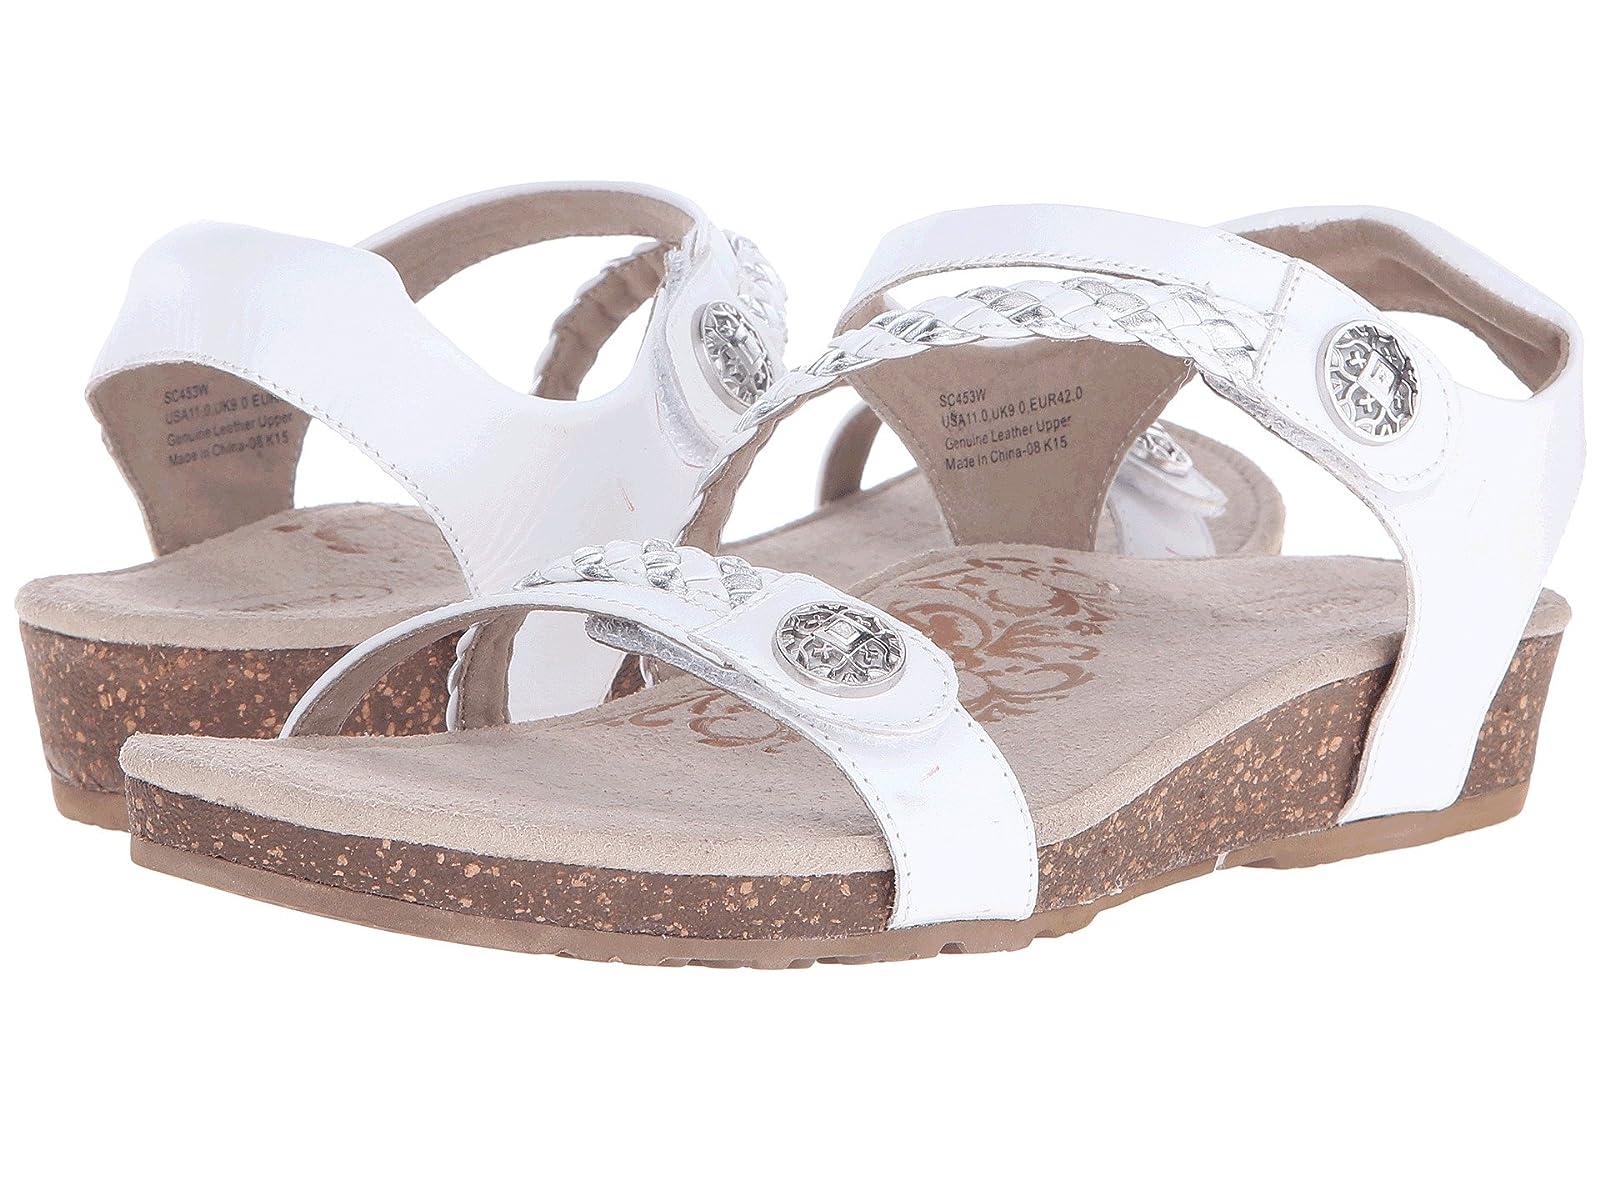 Aetrex Jillian Quarter StrapAtmospheric grades have affordable shoes